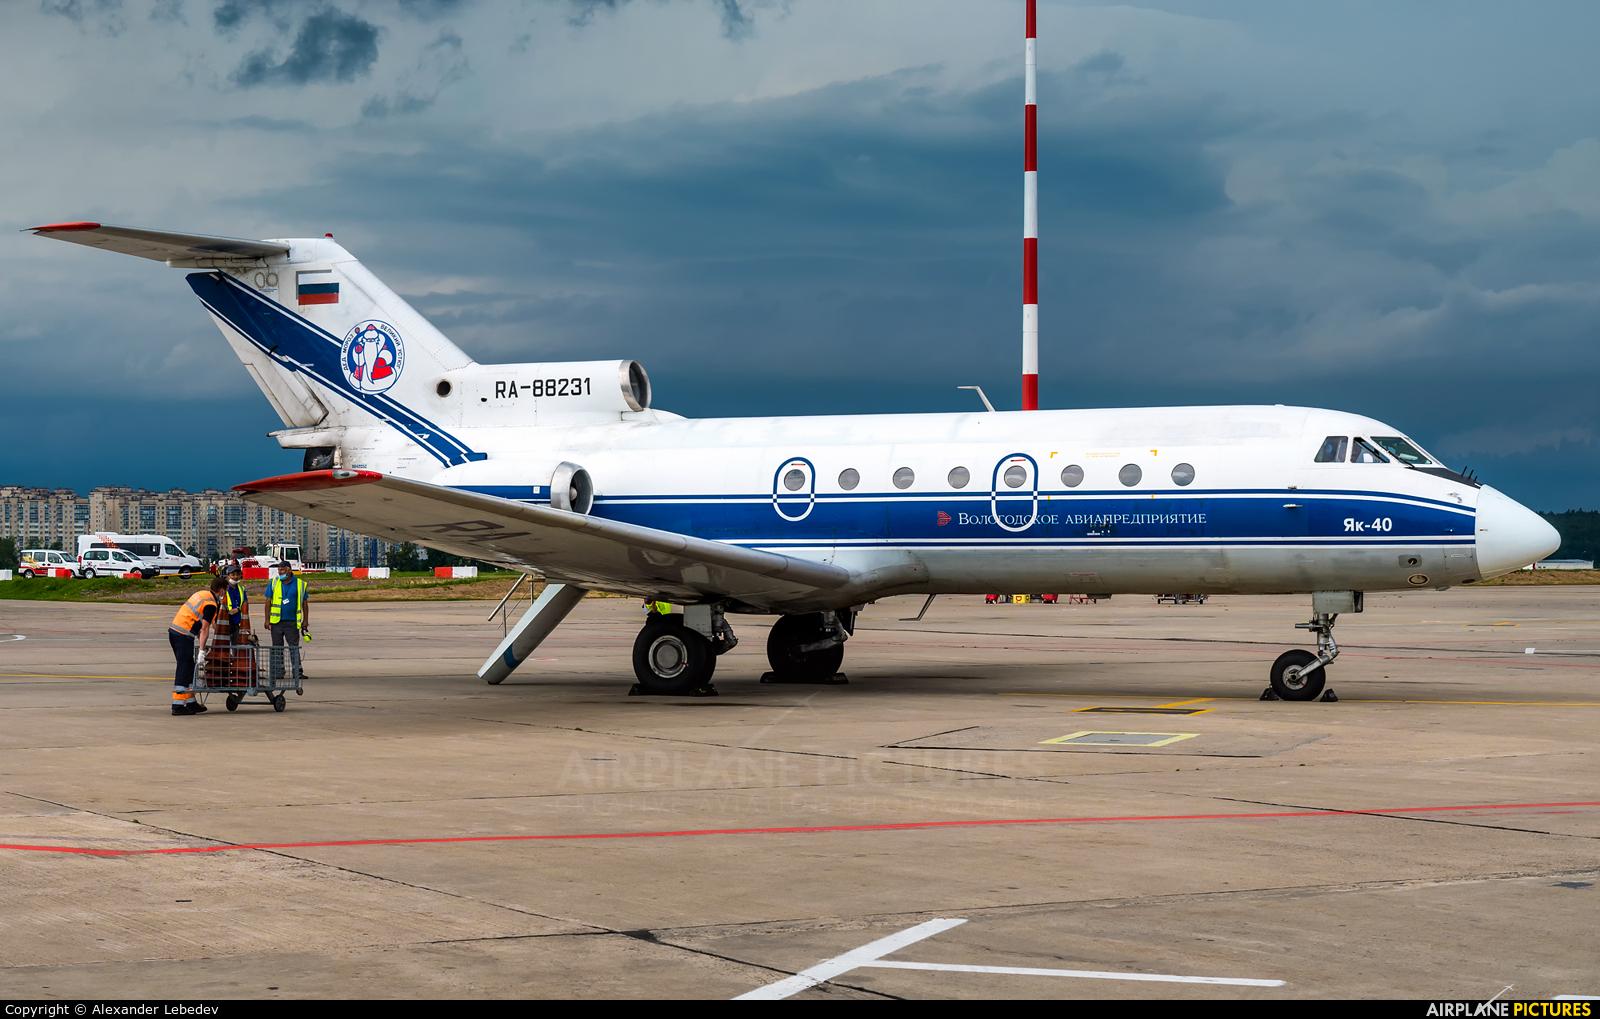 Vologda Air Enterprise RA-88231 aircraft at Moscow - Vnukovo